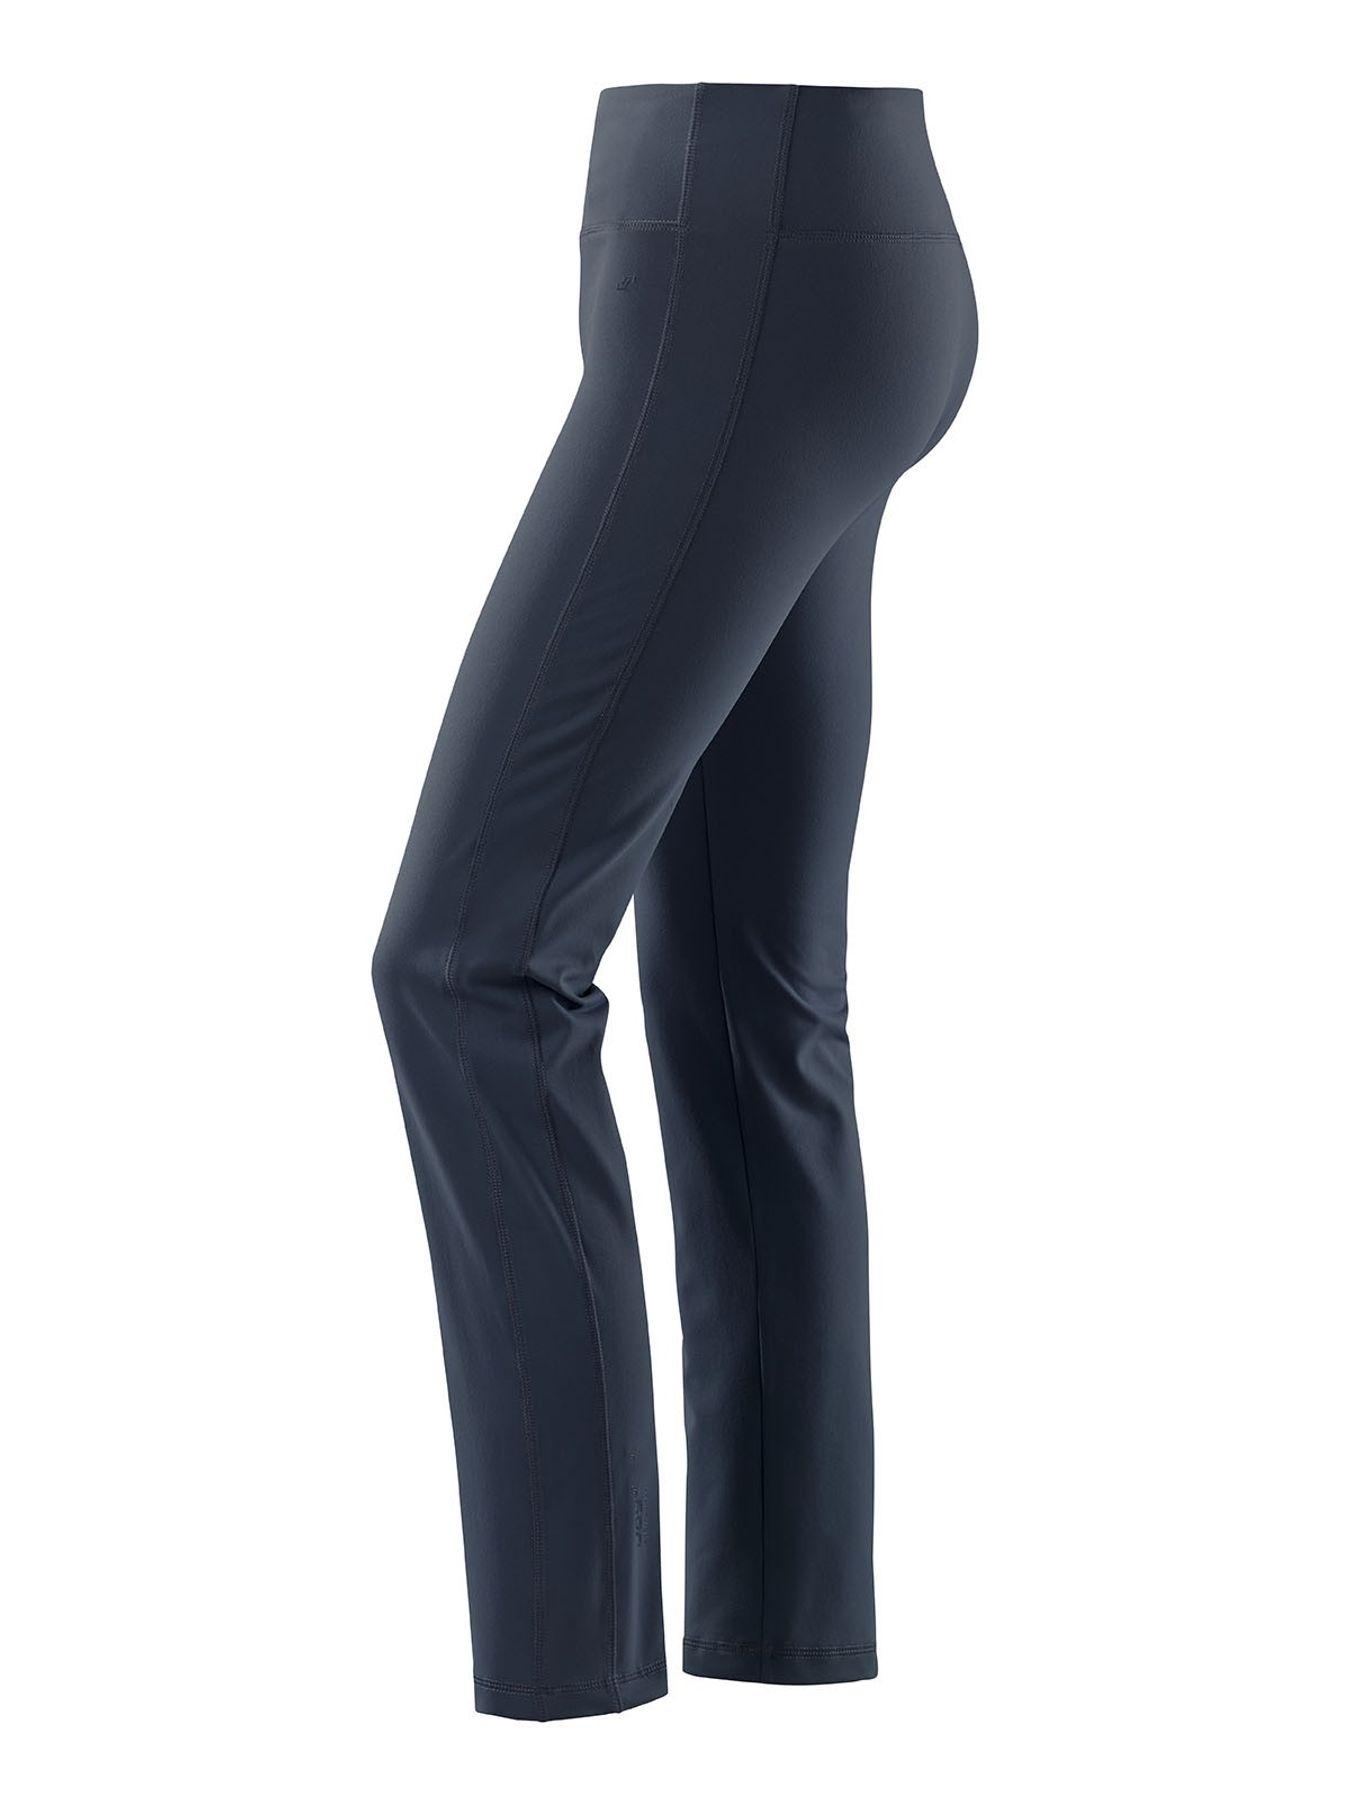 Joy - Bodyfit - Damen Sport Hose in verschiedenen Farben, Ester (30140) – Bild 4